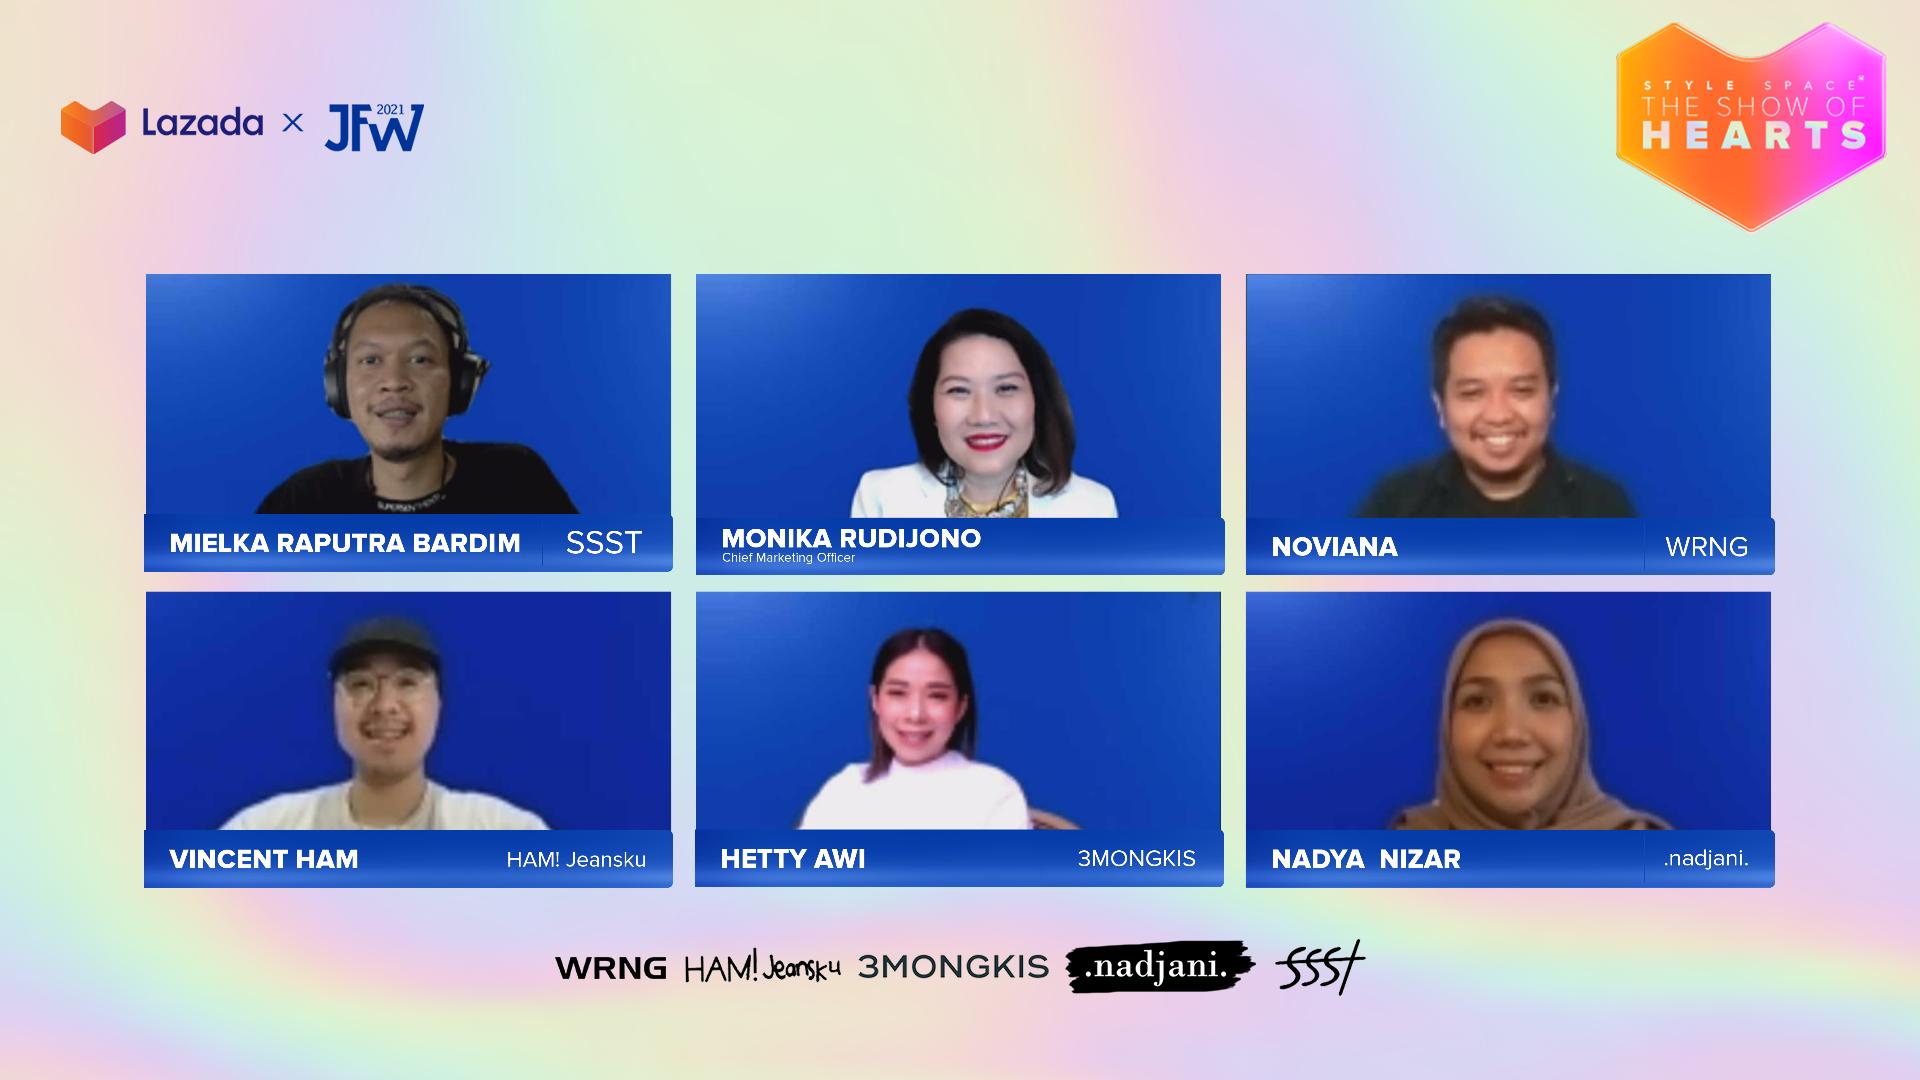 Jakarta-Fashion-Week- Style-Space-The-Show-of-Hearts-berkolaborasi-dengan-5-desainer-lokal